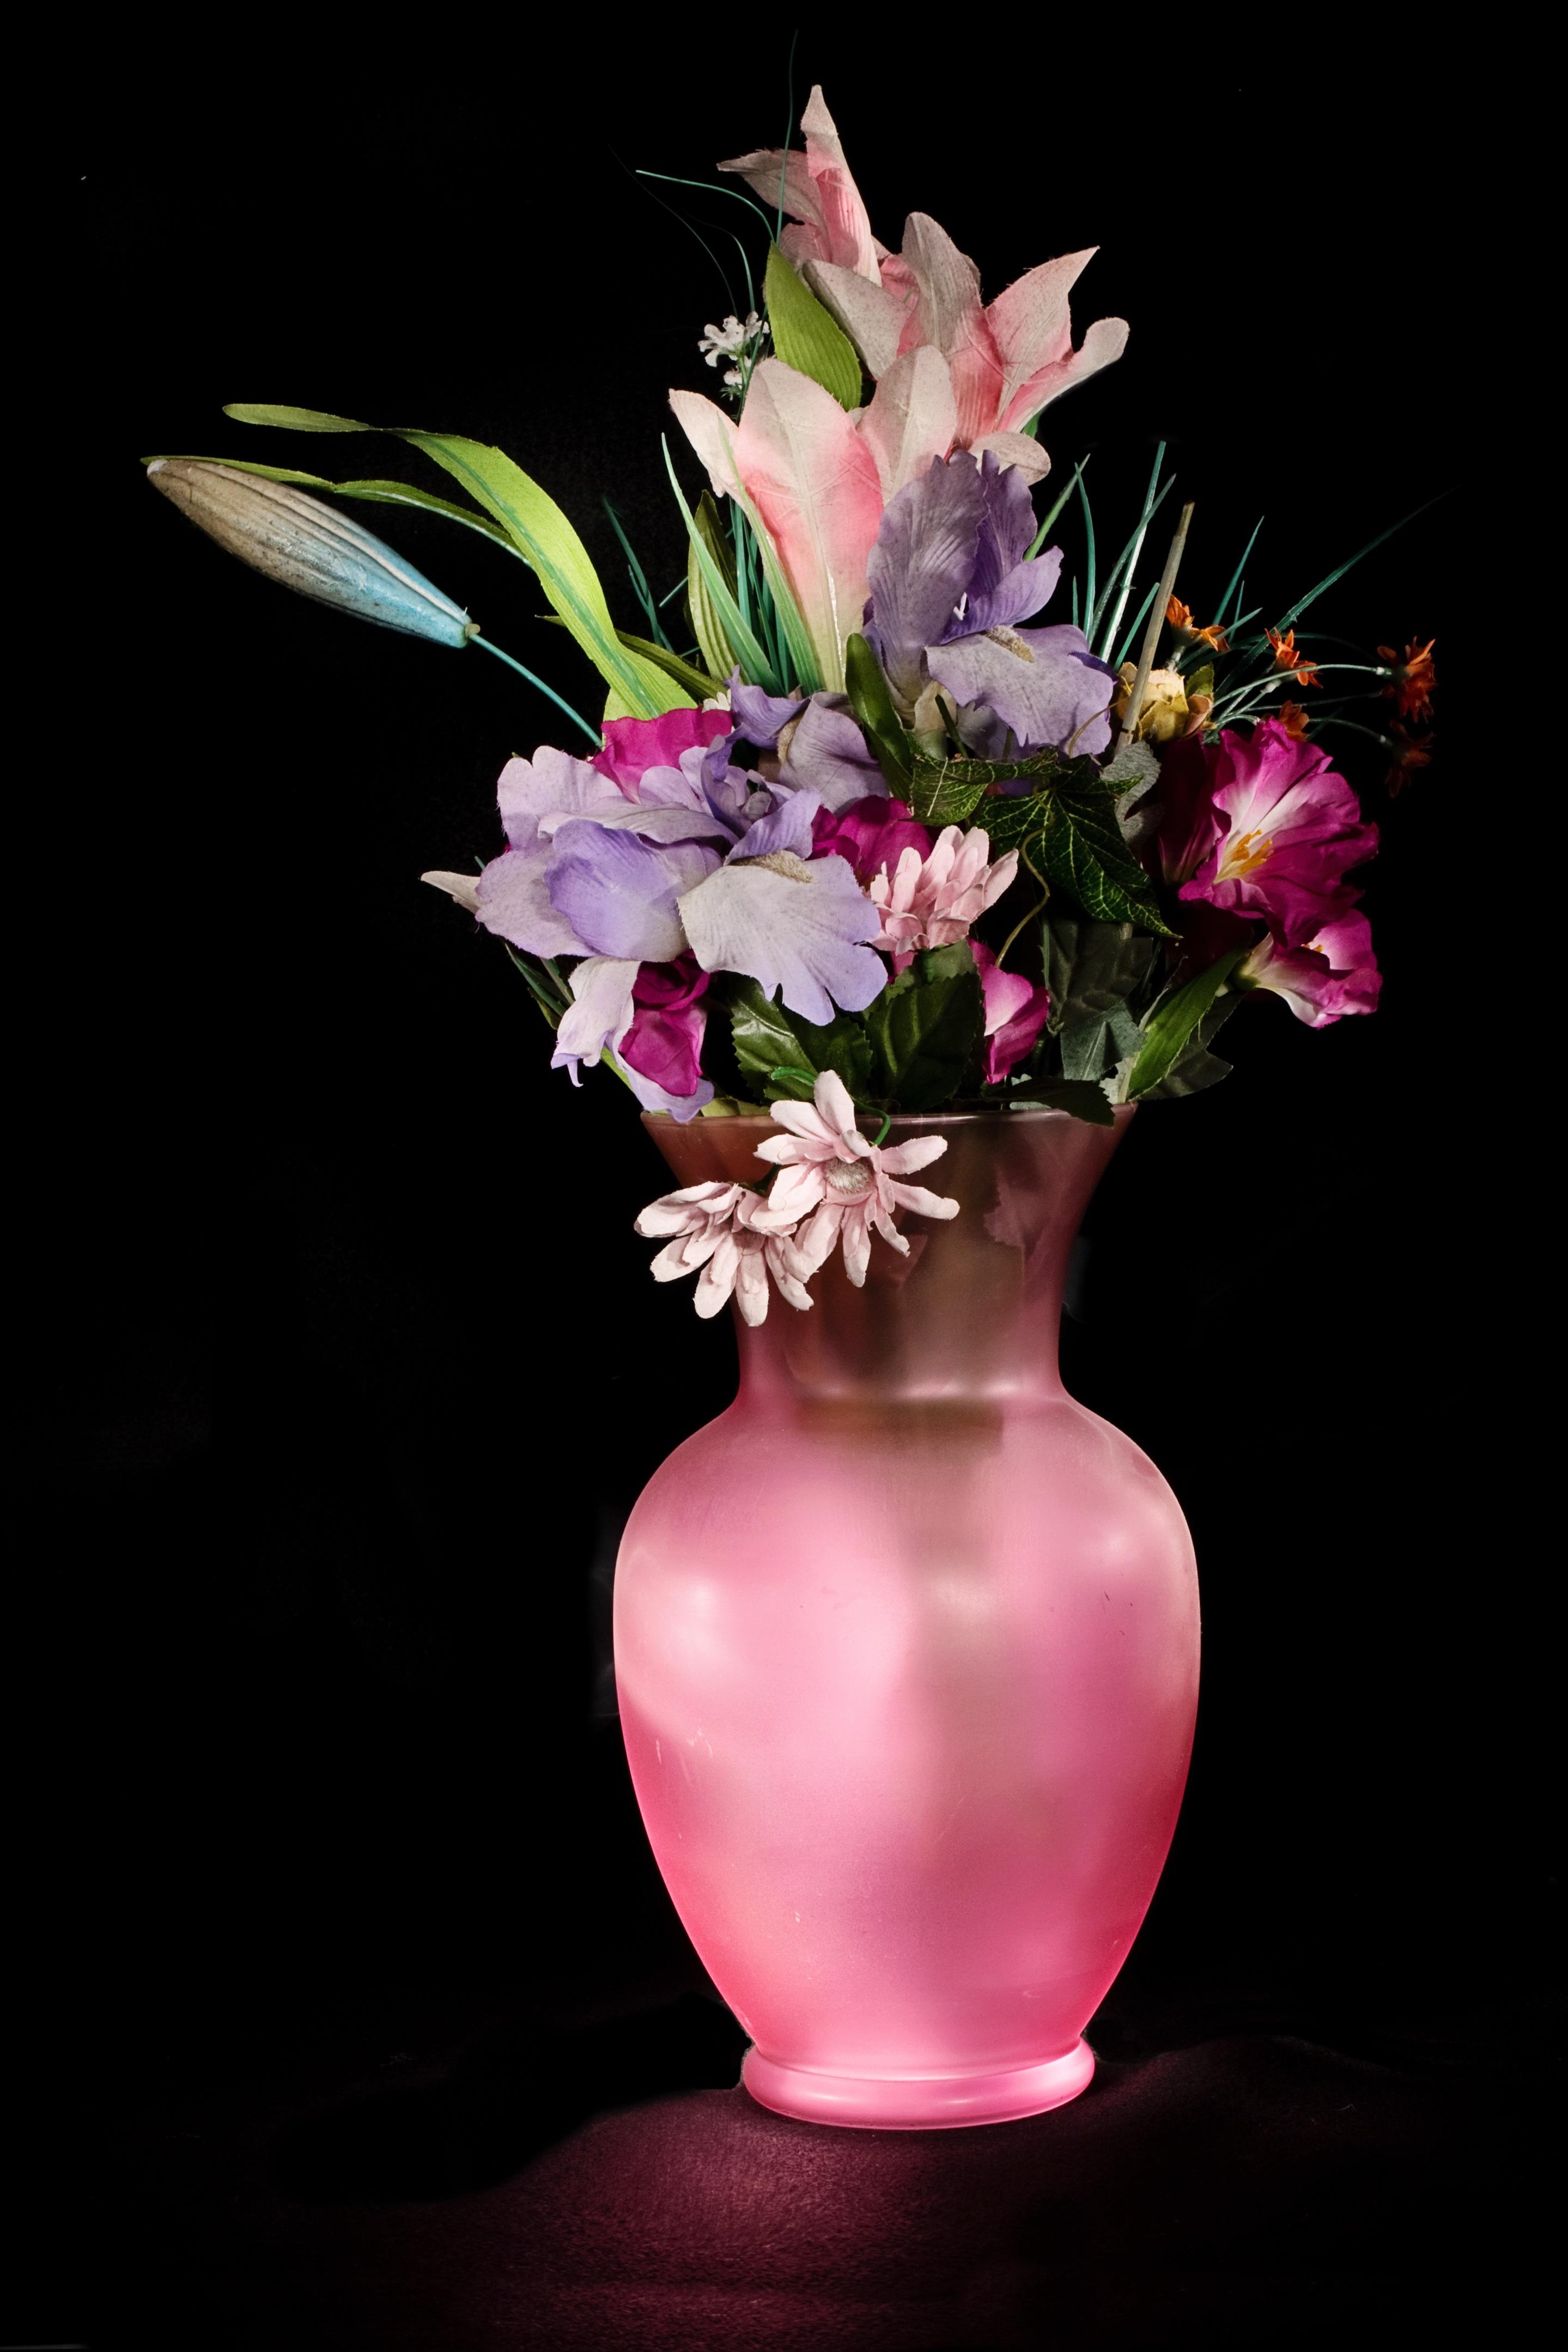 Free images purple petal vase pink flora still life art plant flower purple petal vase pink flora still life art floristry flowery flowering plant flower bouquet reviewsmspy